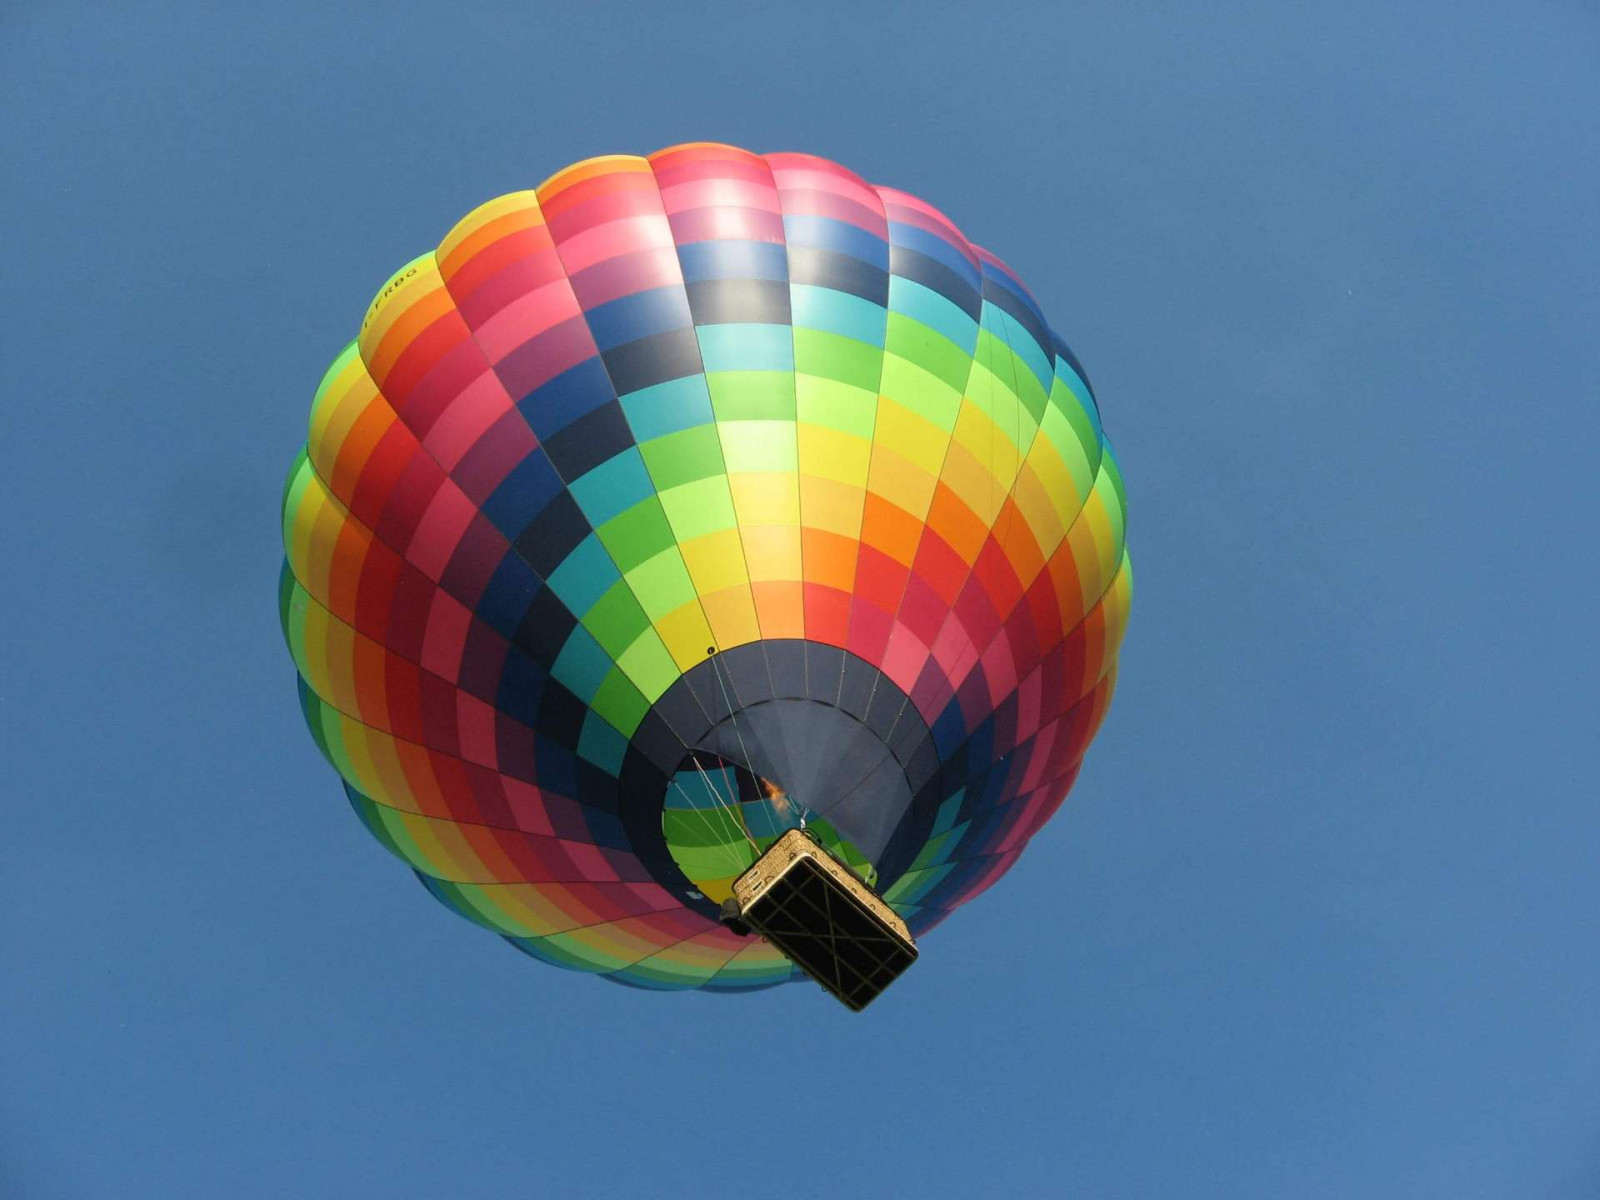 Volo in mongolfiera a San Colombano al Lambro